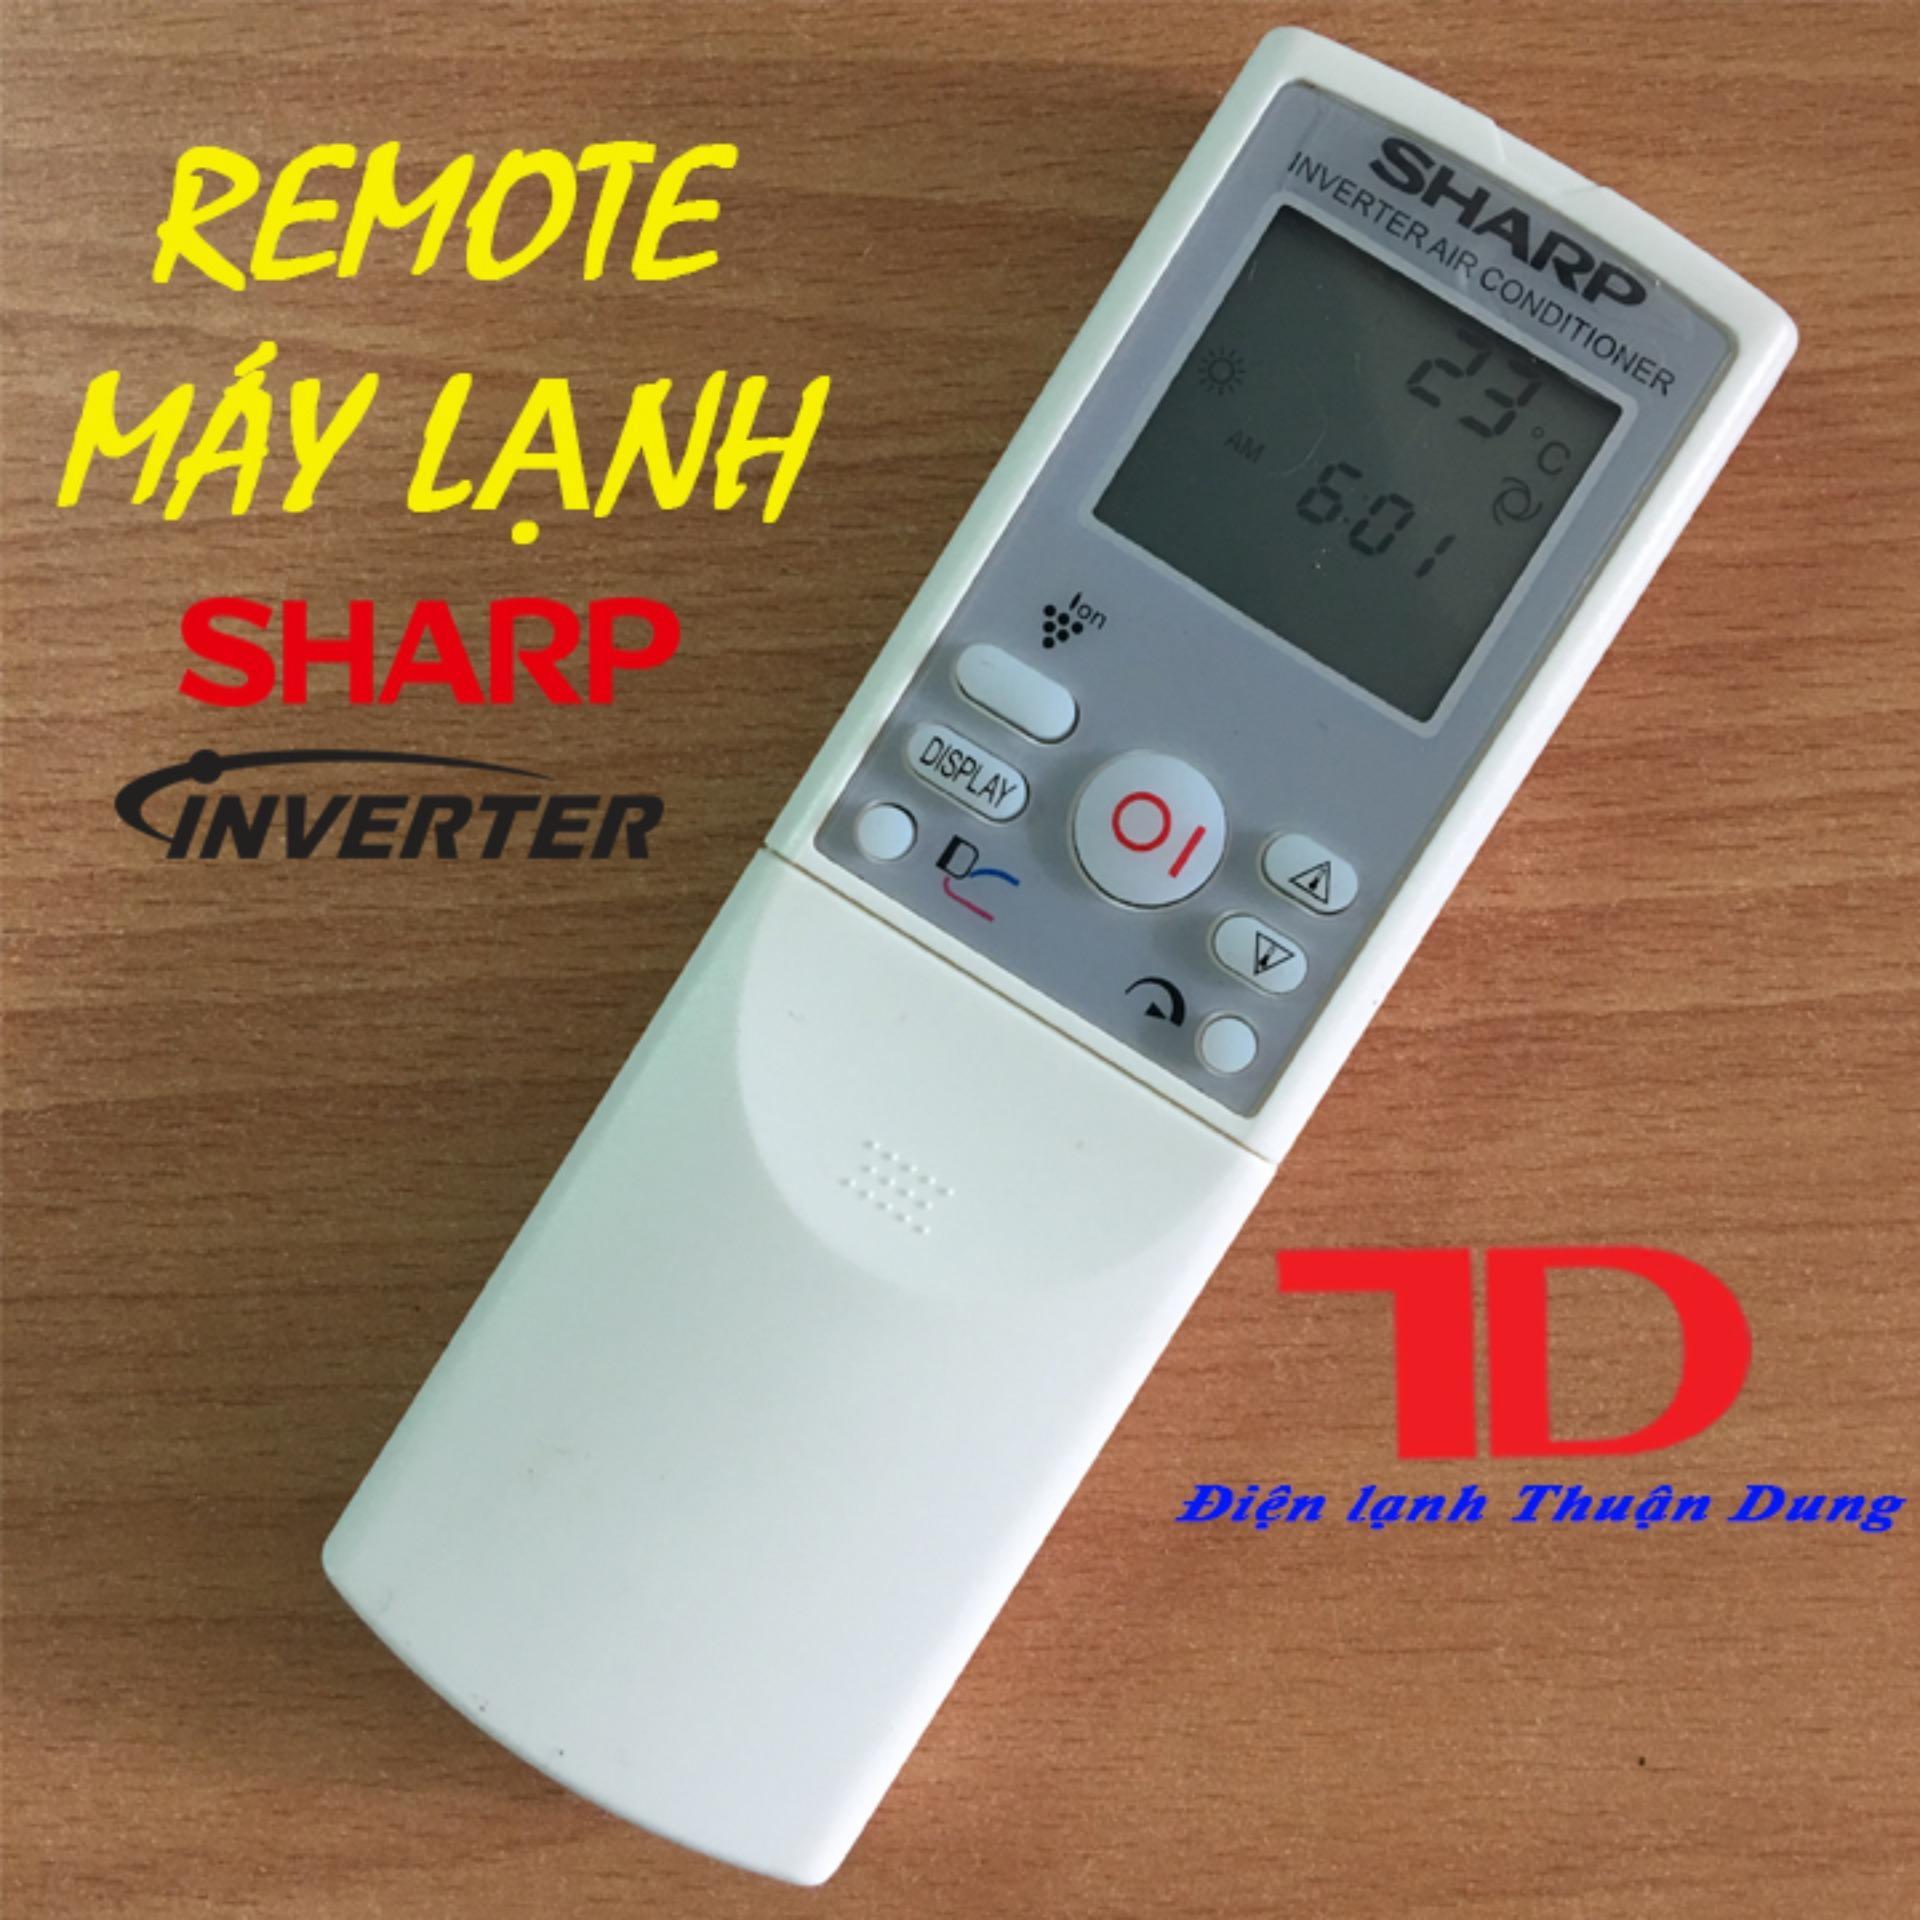 Remote máy lạnh SHARP inverter